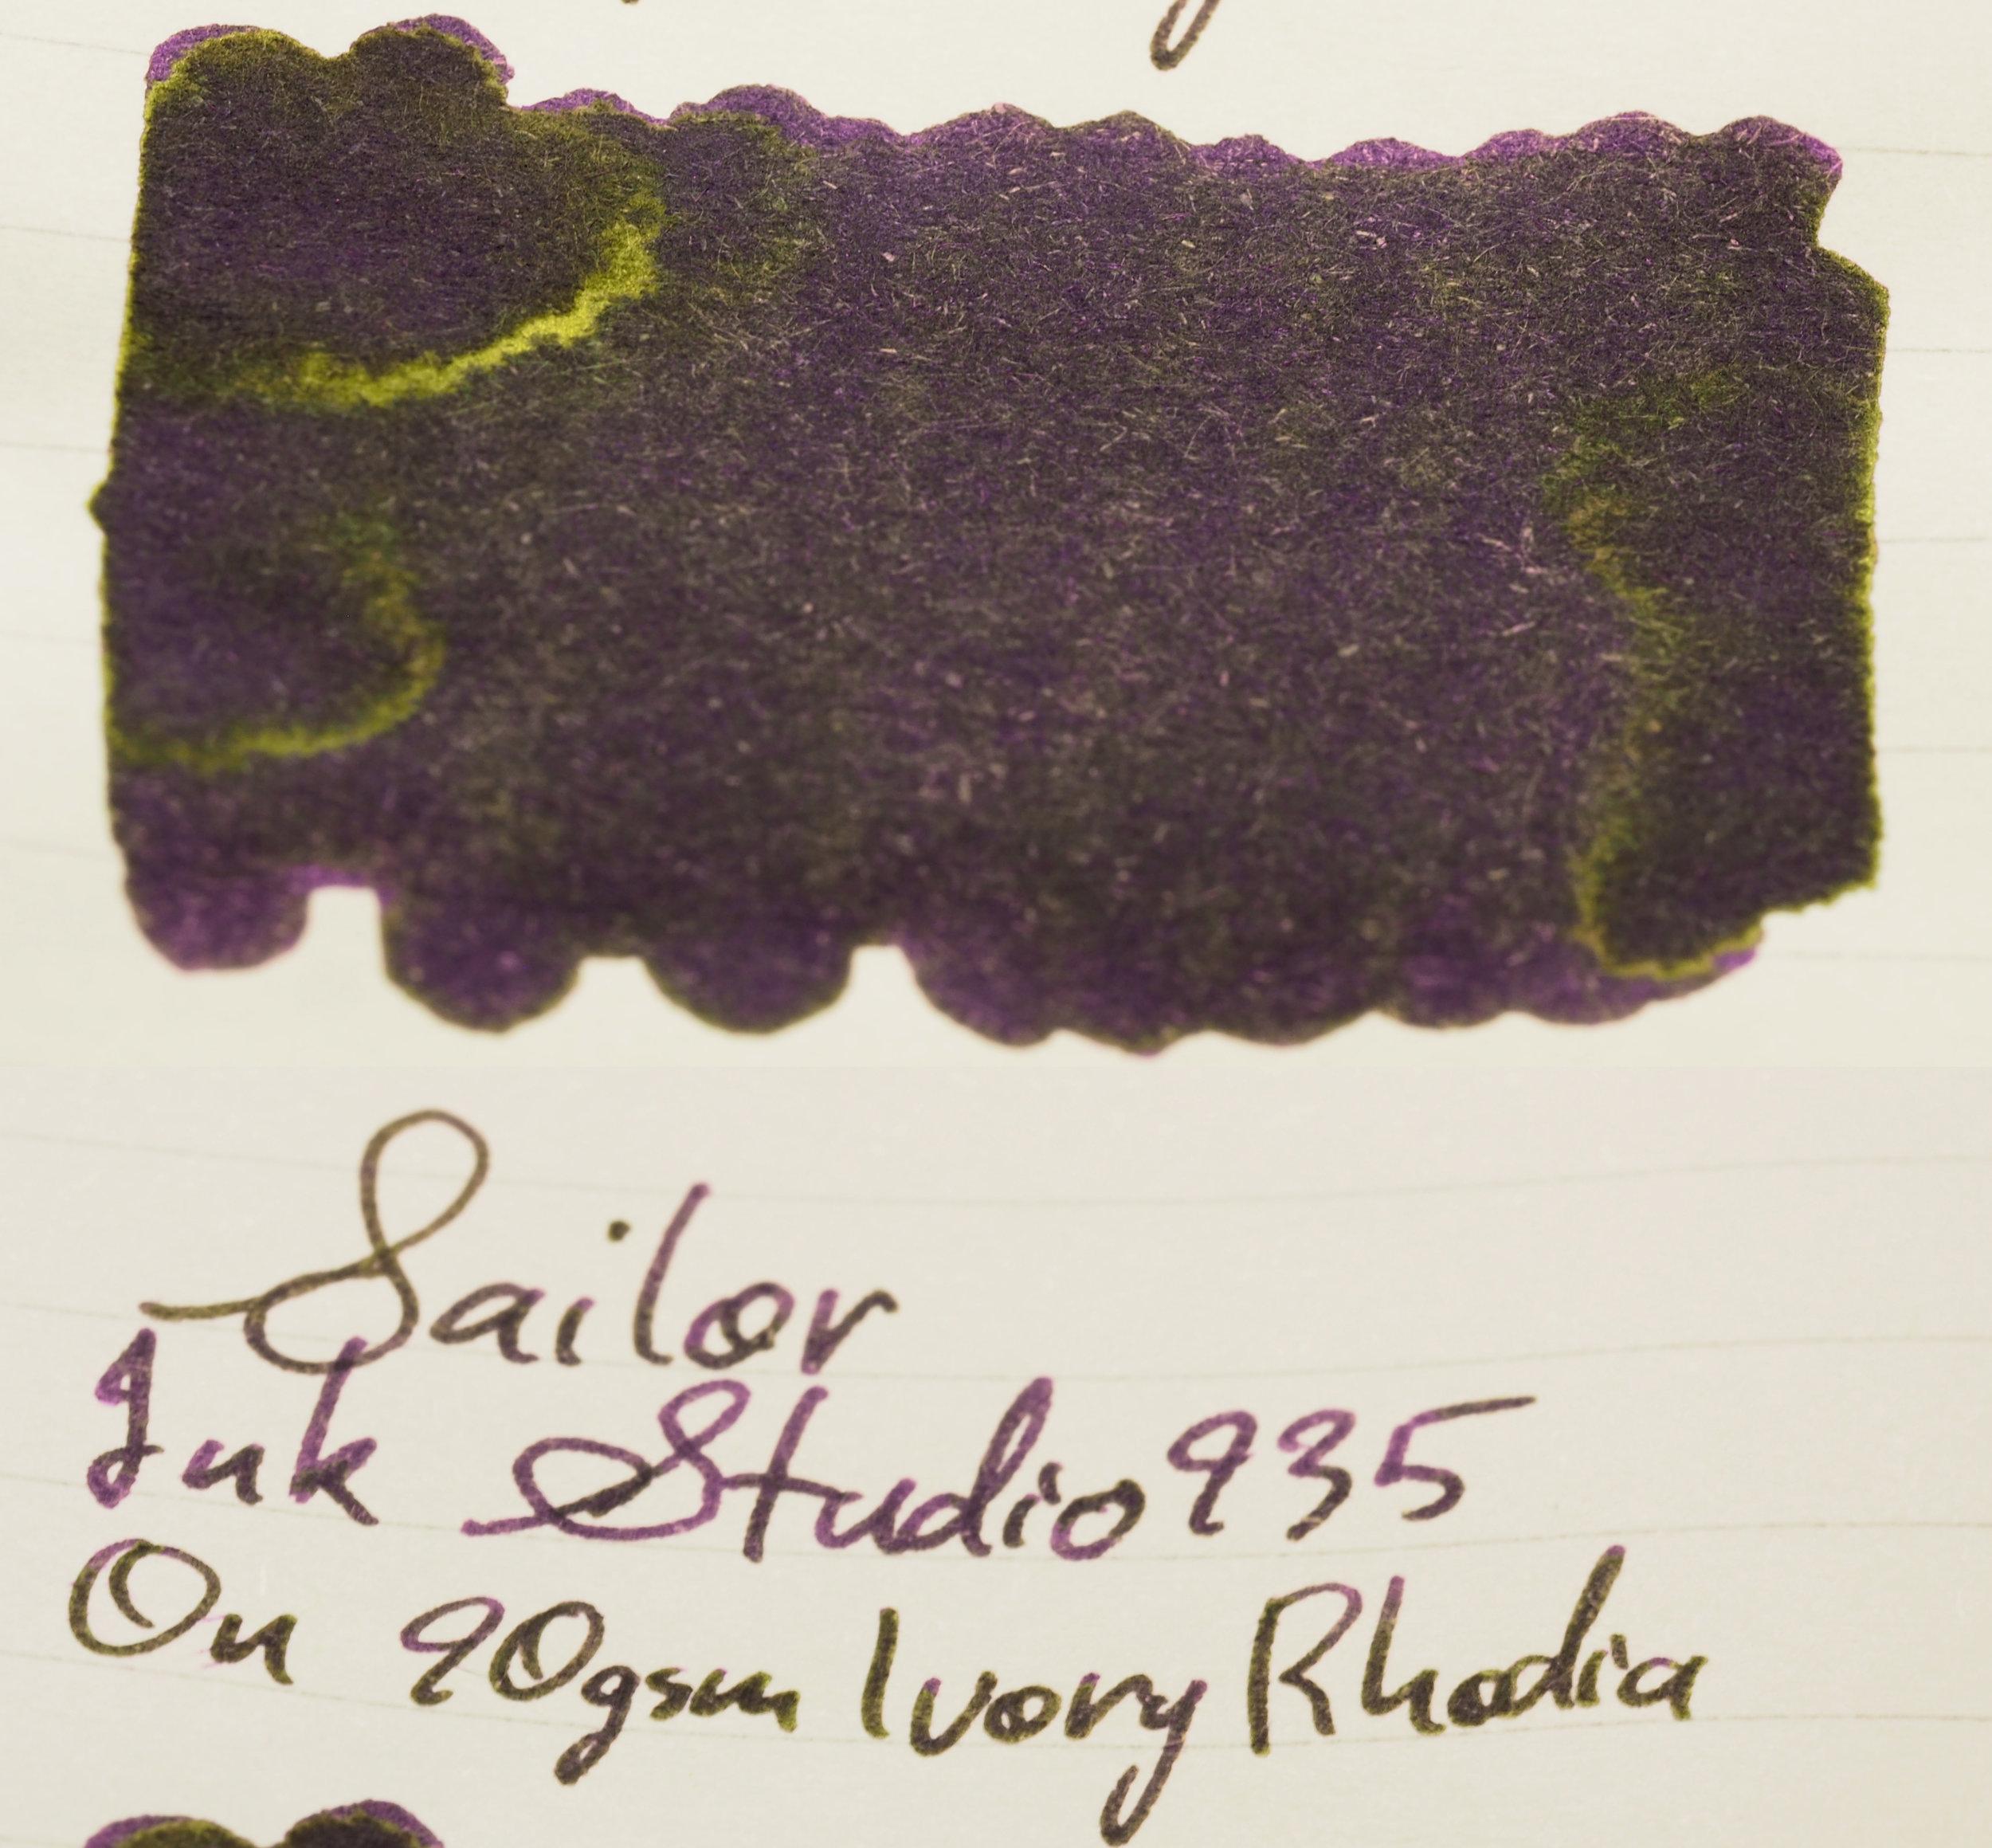 Sheen 90gsm Ivory Rhodia